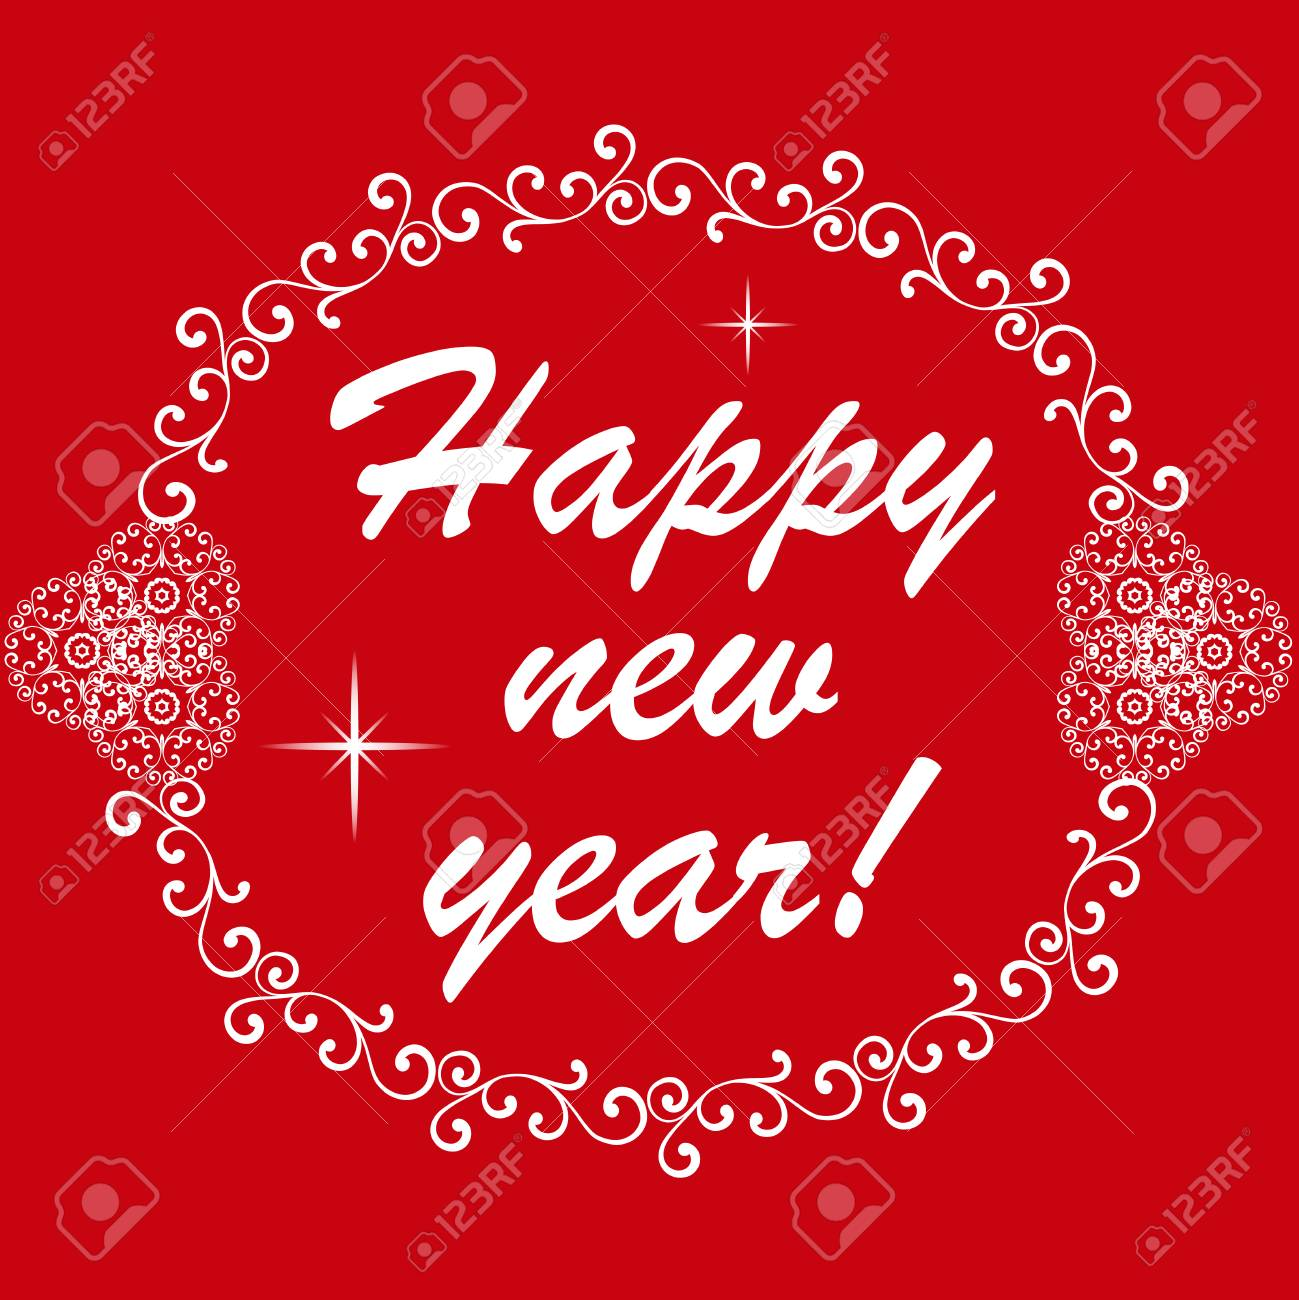 Happy new year 2015 vector illustration invitation or greeting happy new year 2015 vector illustration invitation or greeting card design stock vector m4hsunfo